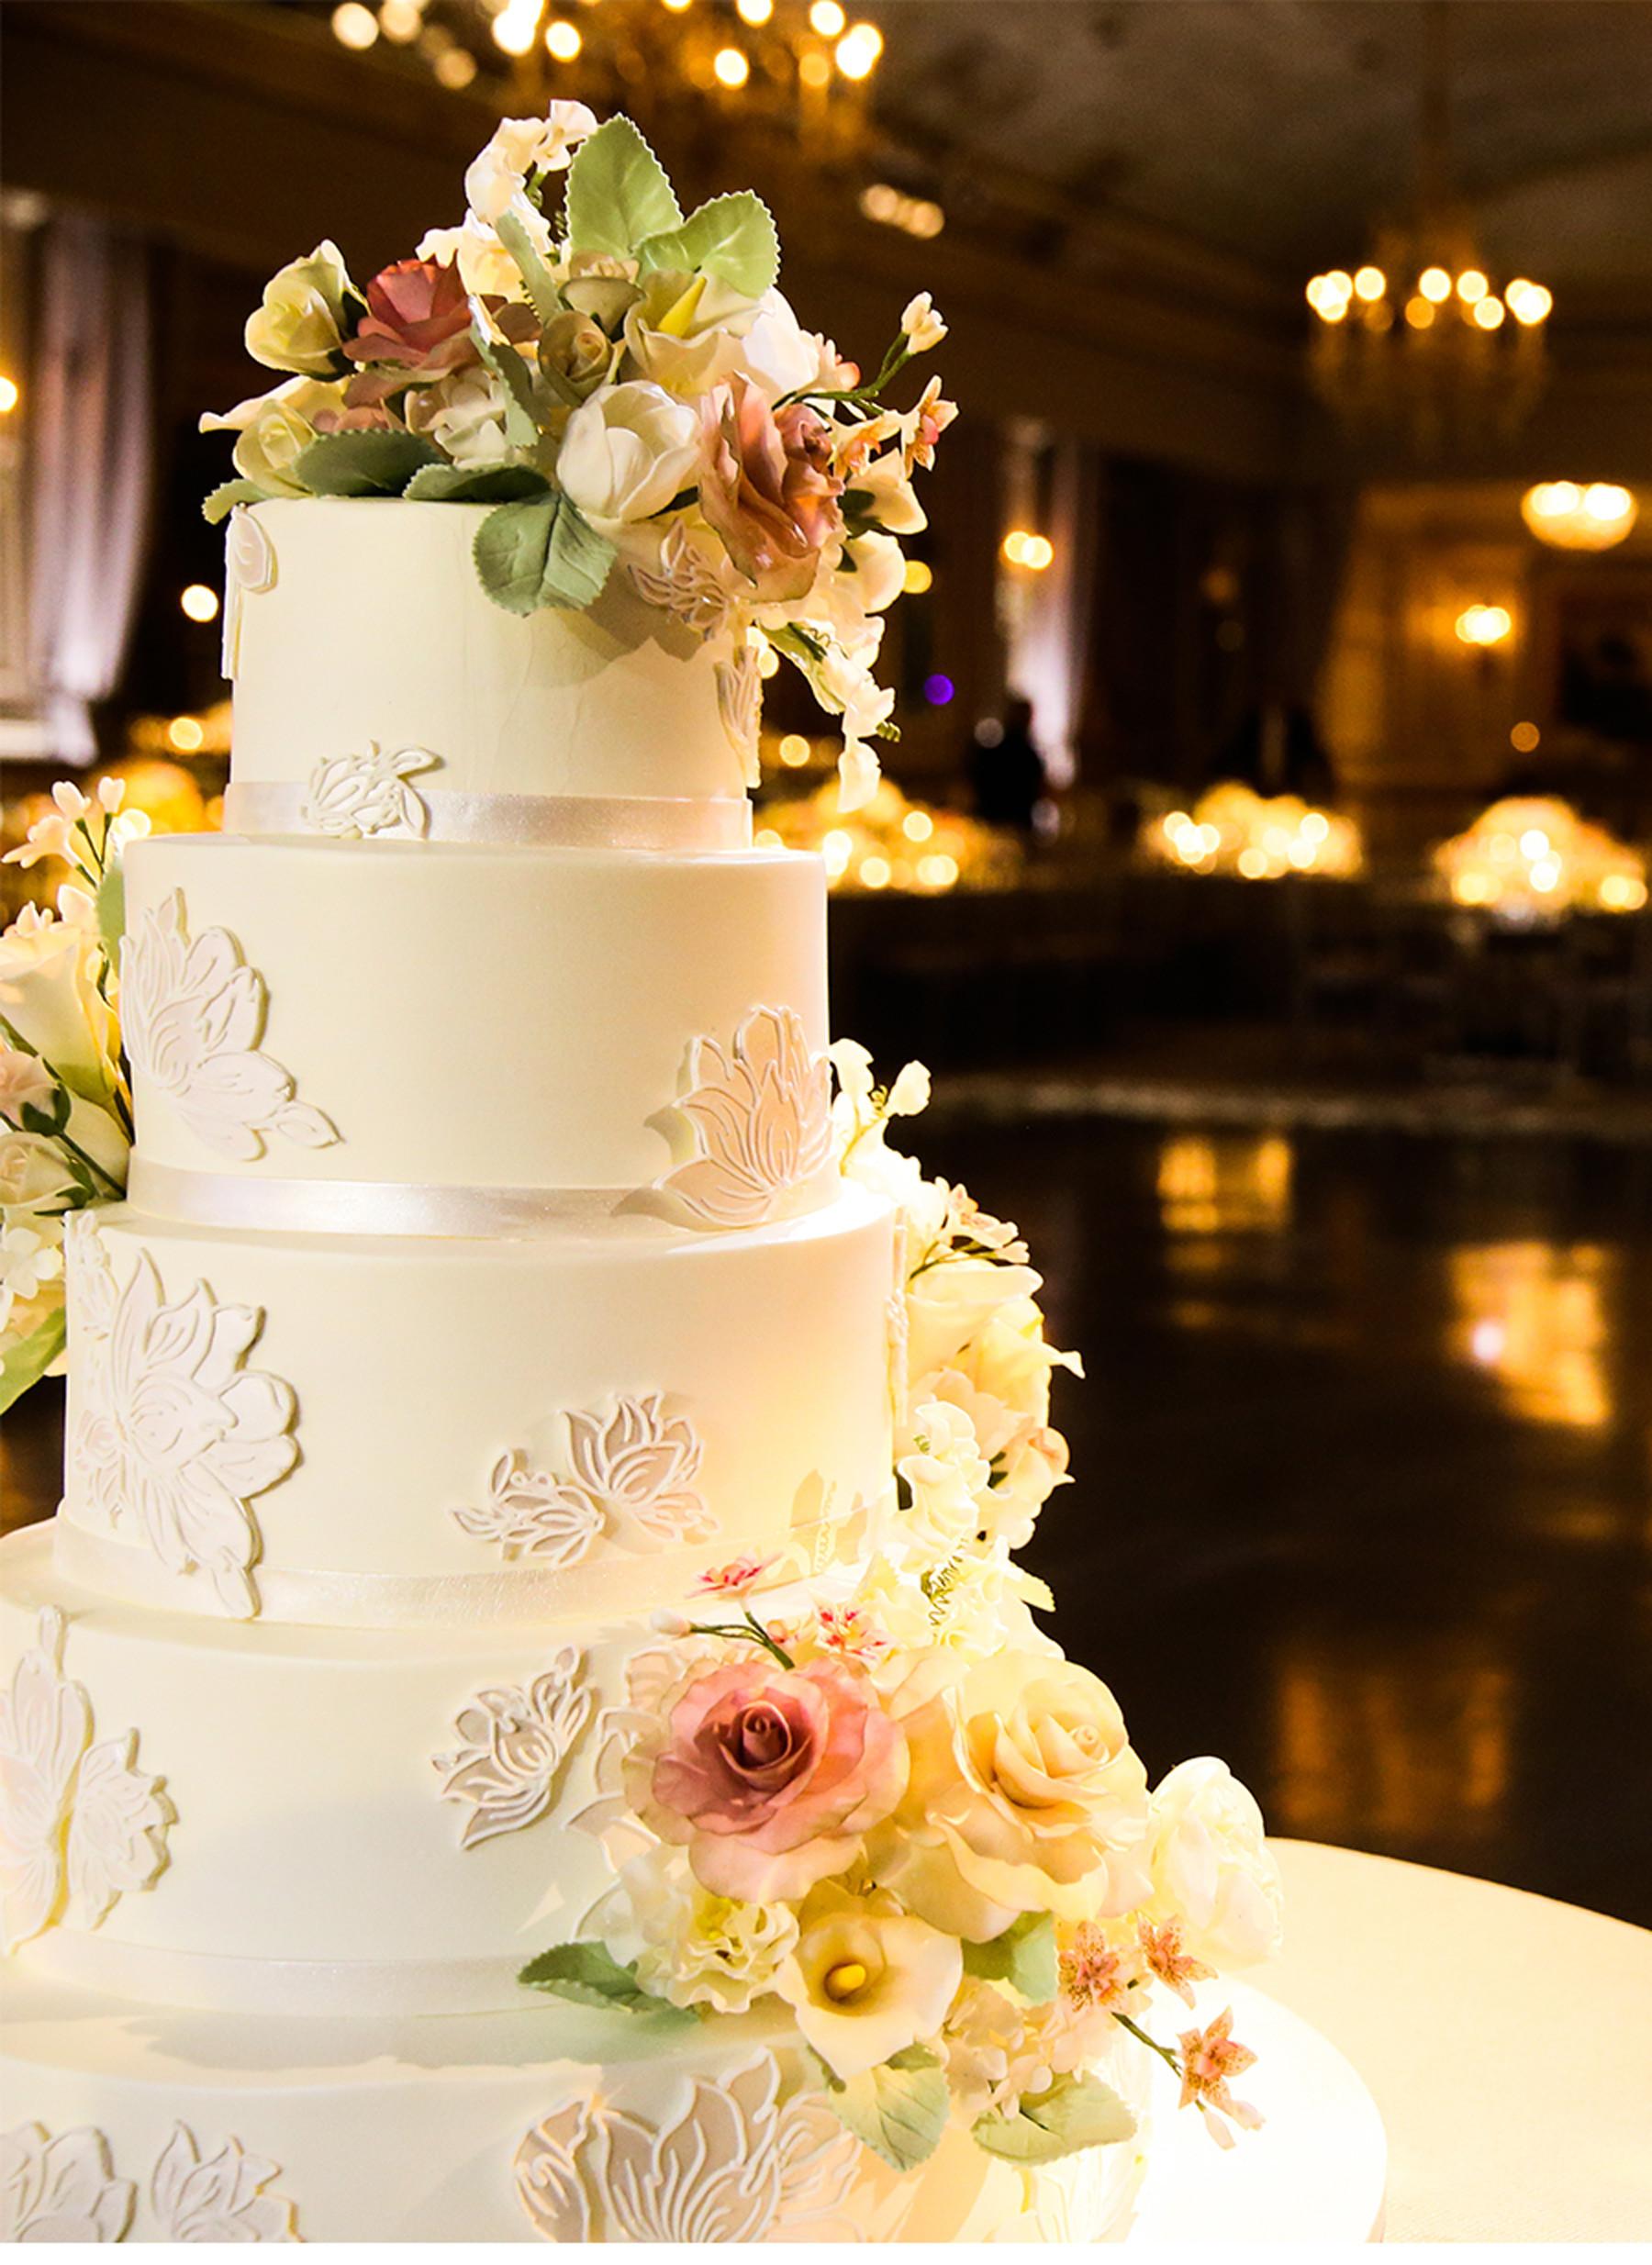 Wedding Cakes Nyc  Wedding Cakes New York City